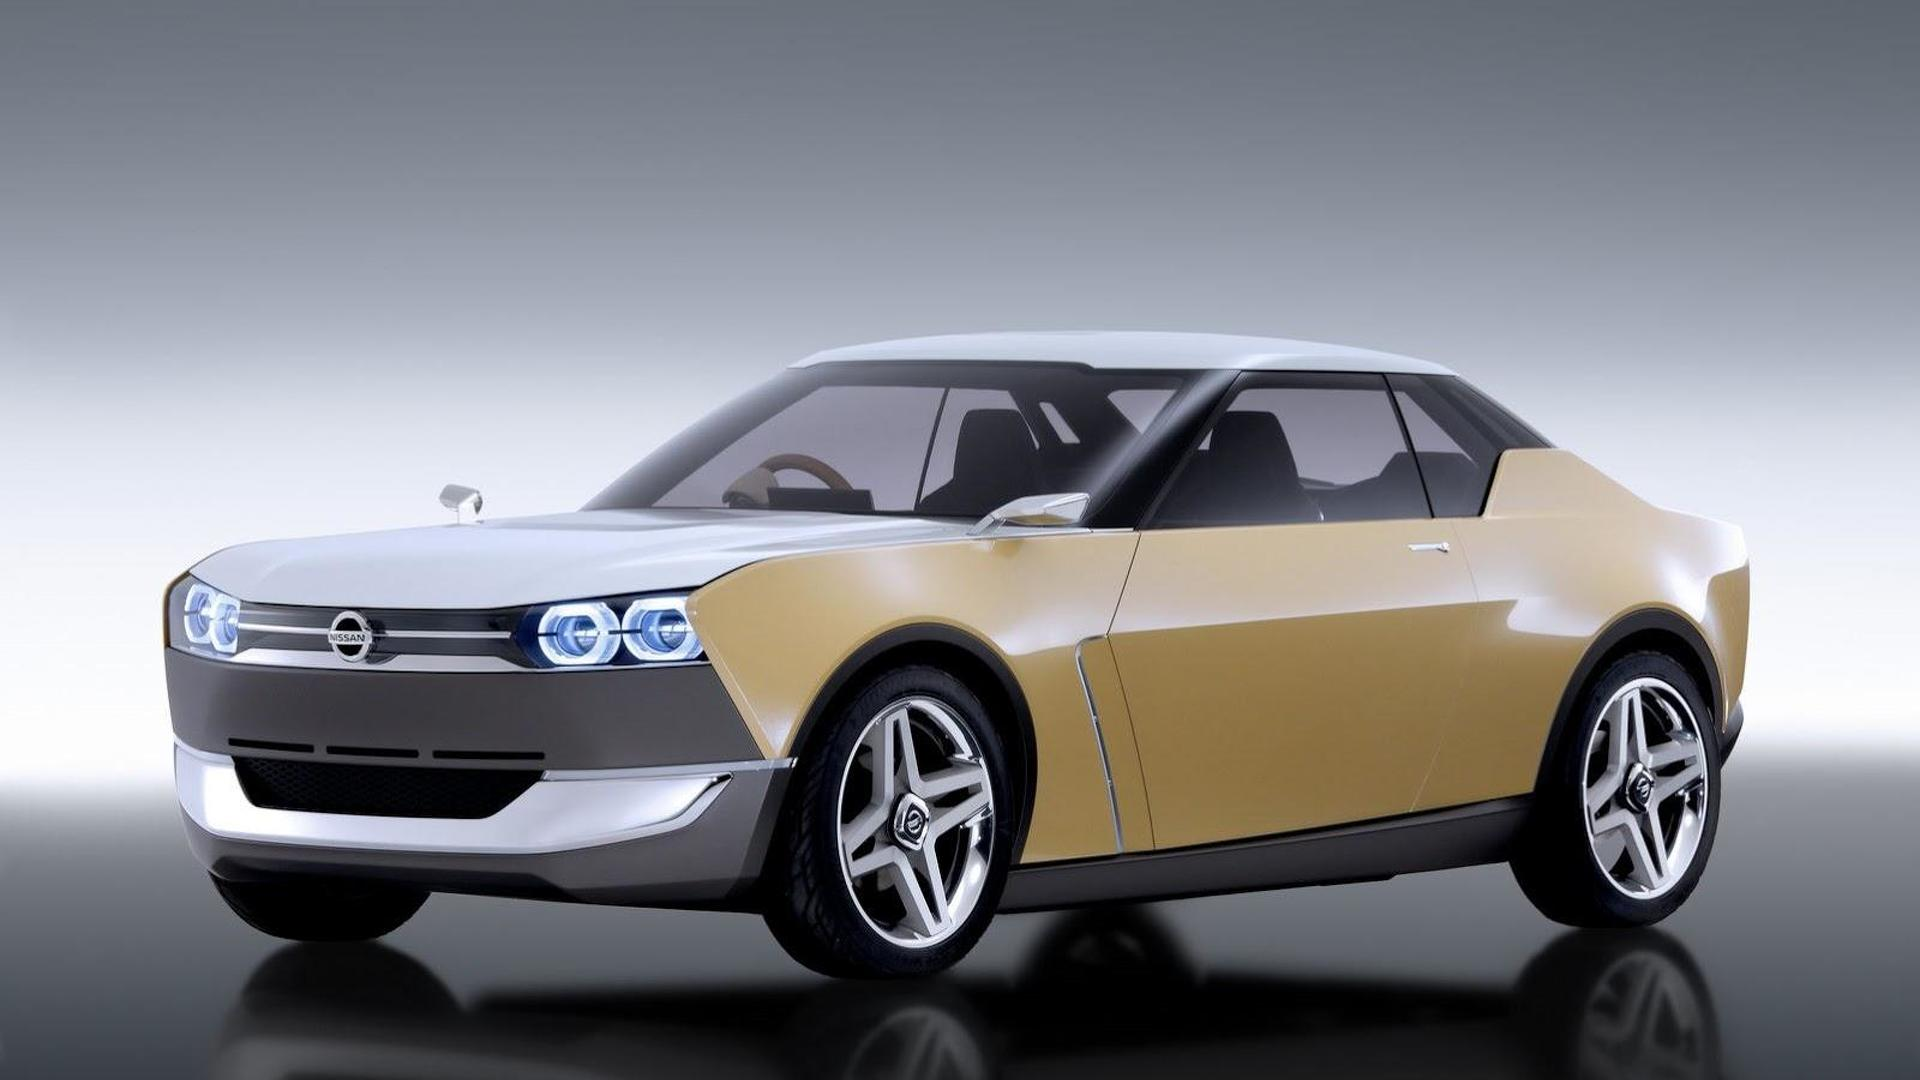 Nissan IDx concept could spawn Silvia successor